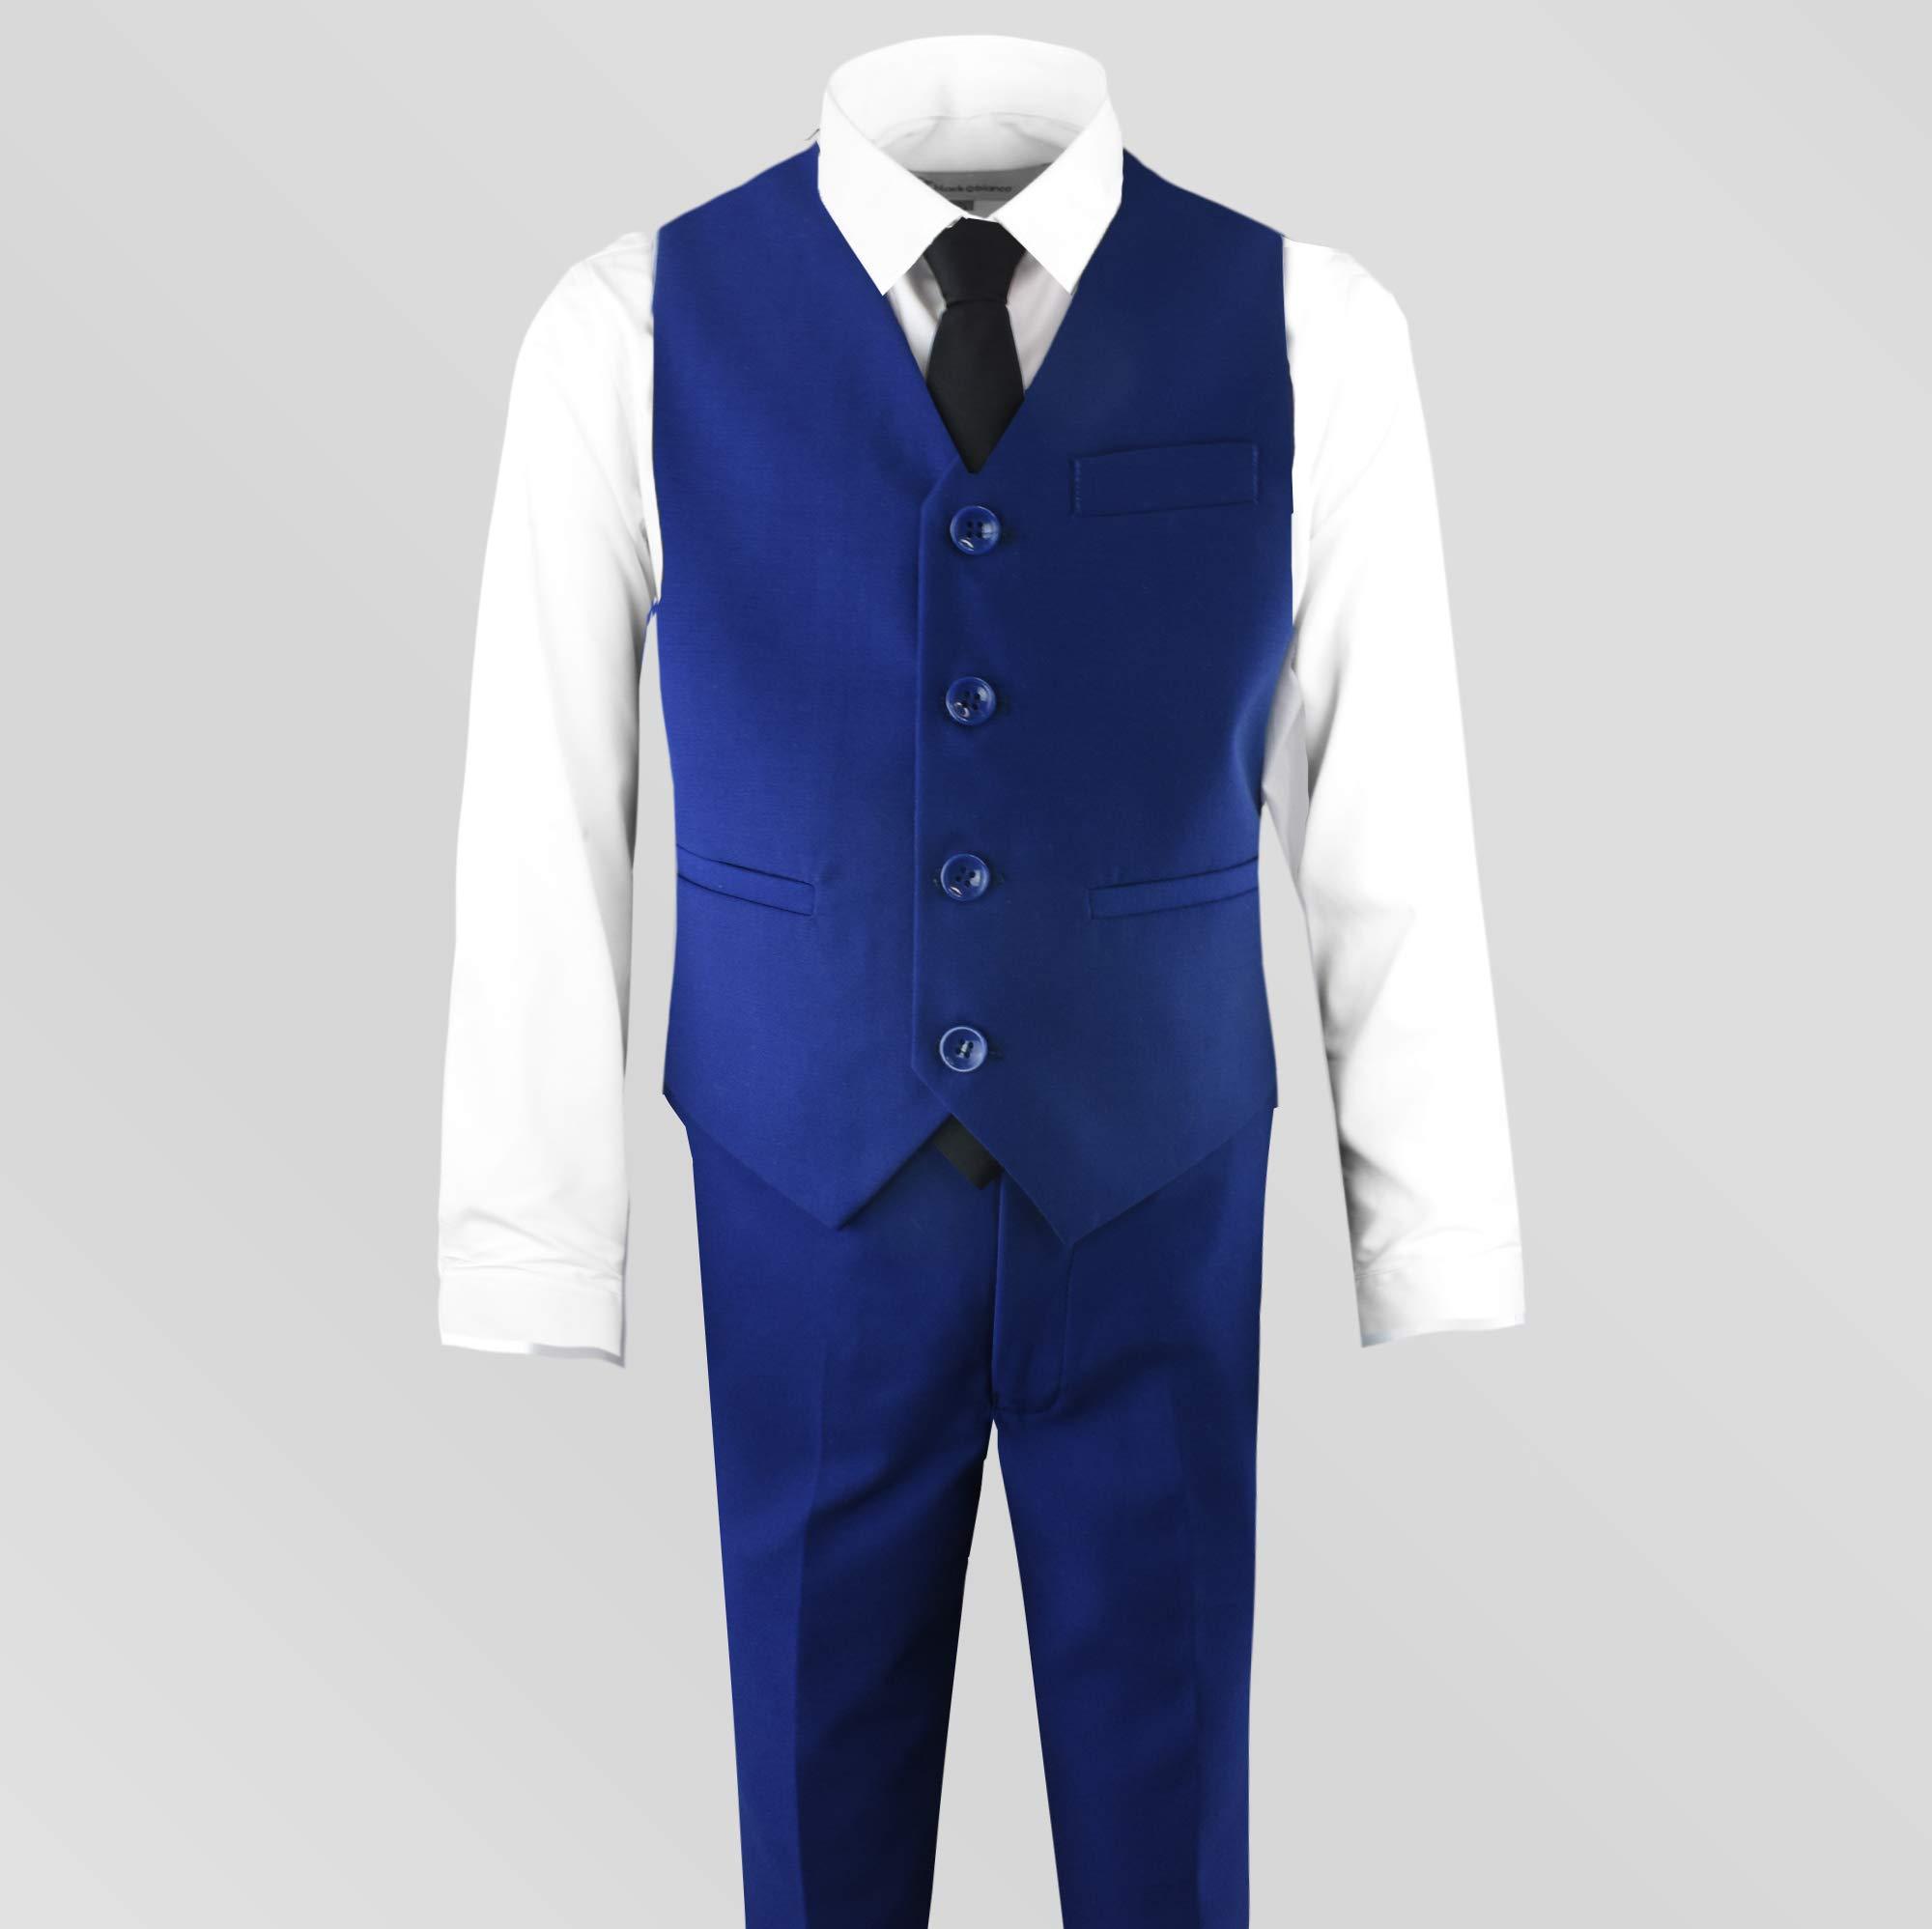 Black n Bianco Signature Boys' Slim Fit Suit Complete Outfit (7, Blue) by Black n Bianco (Image #6)